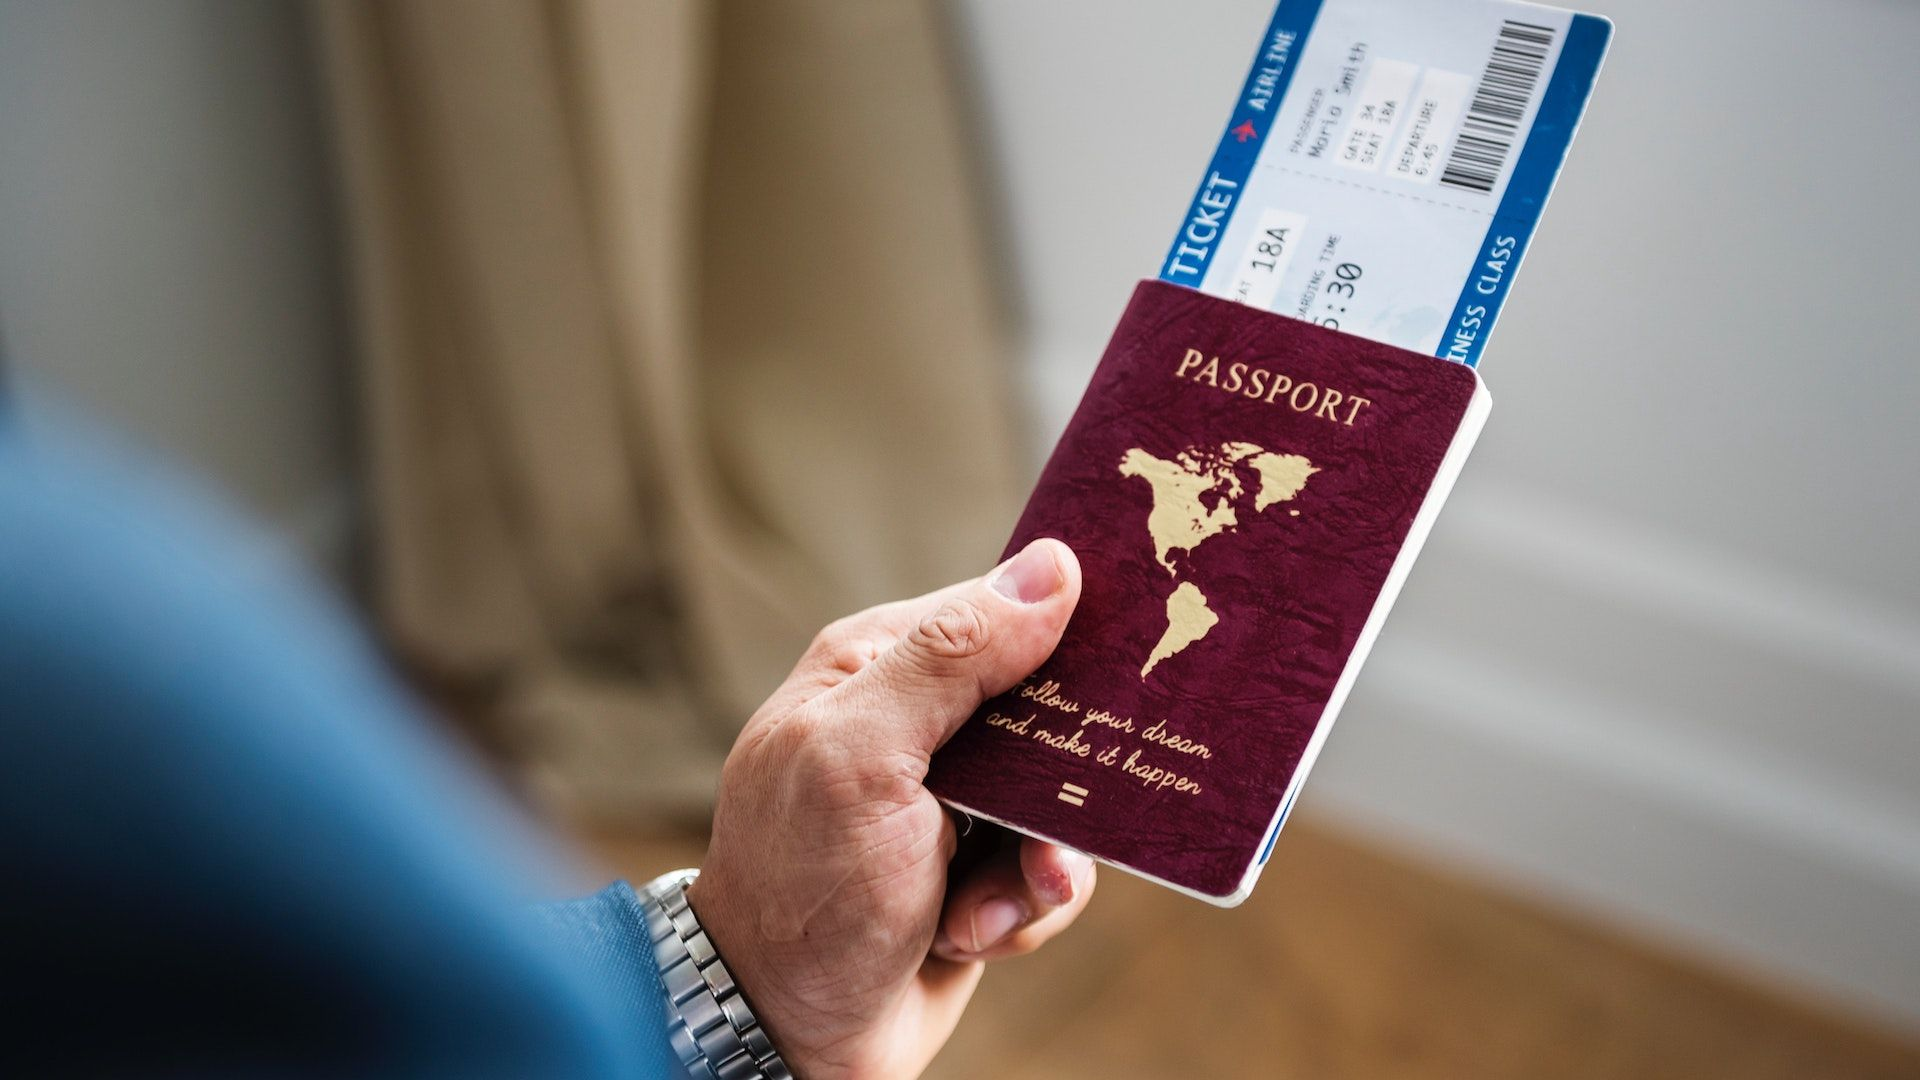 ¿Cuáles son los pasaportes más poderosos de Latinoamérica?